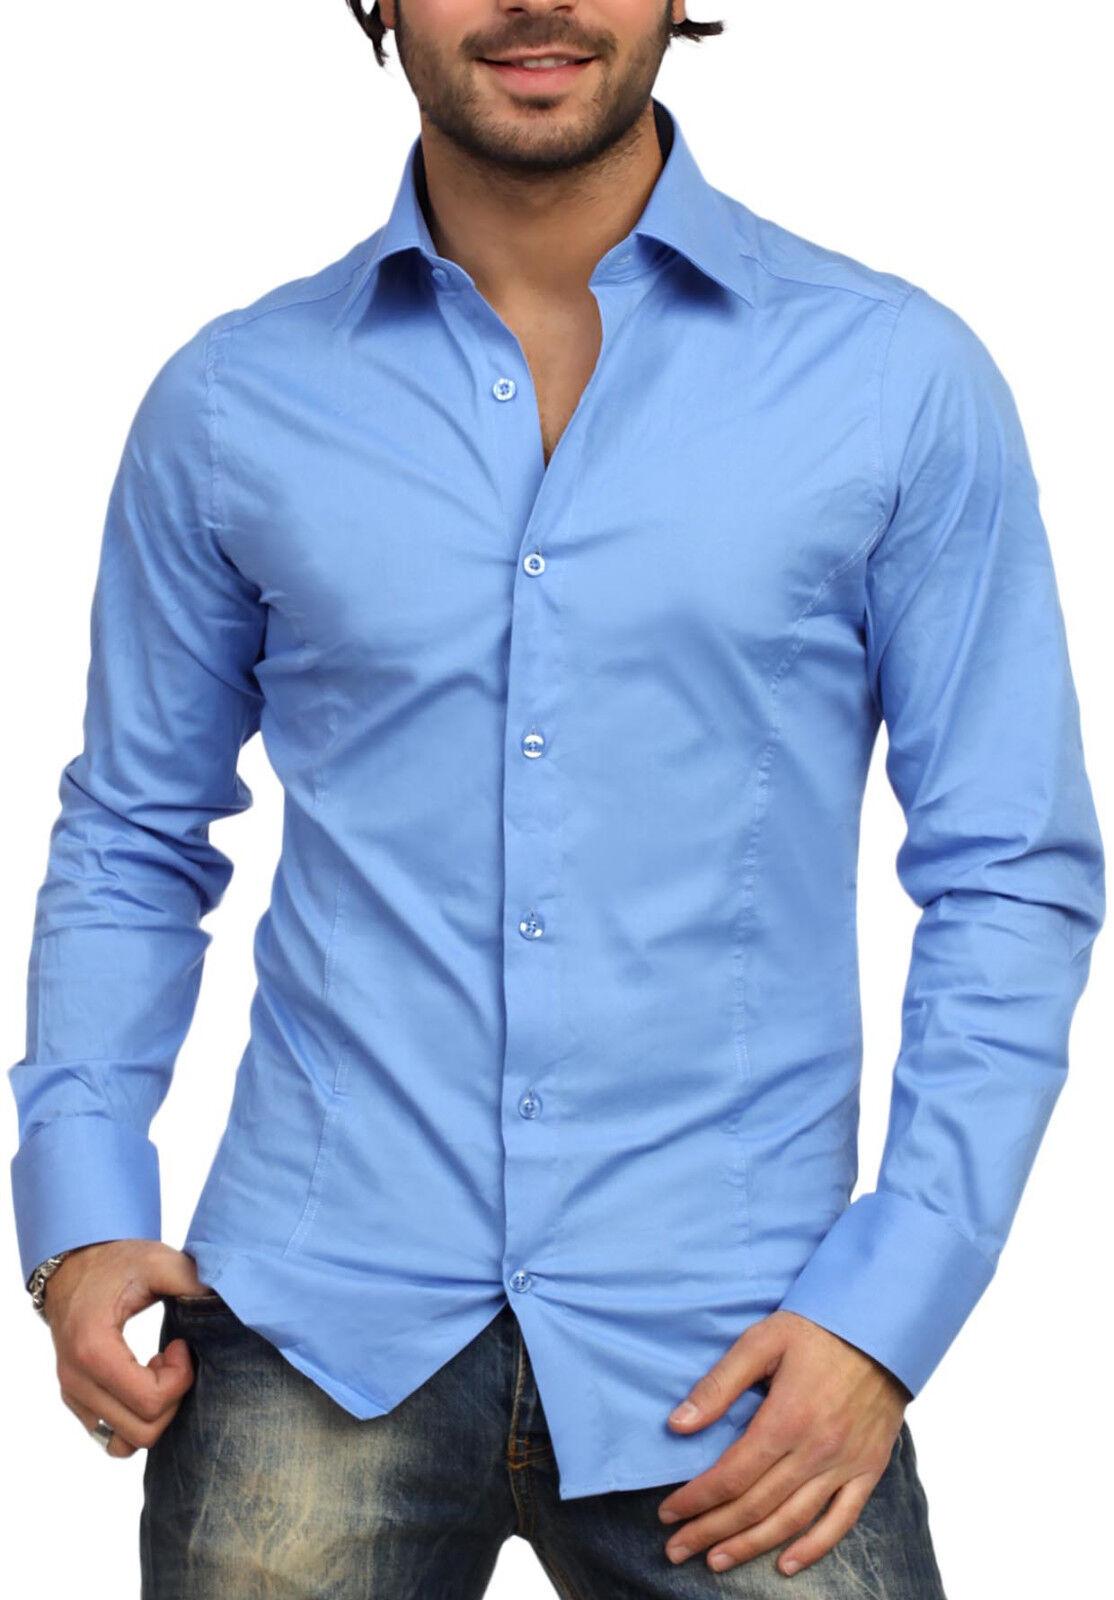 Azzurra Celeste - Sky Blue Longsleeve Shirt Moda